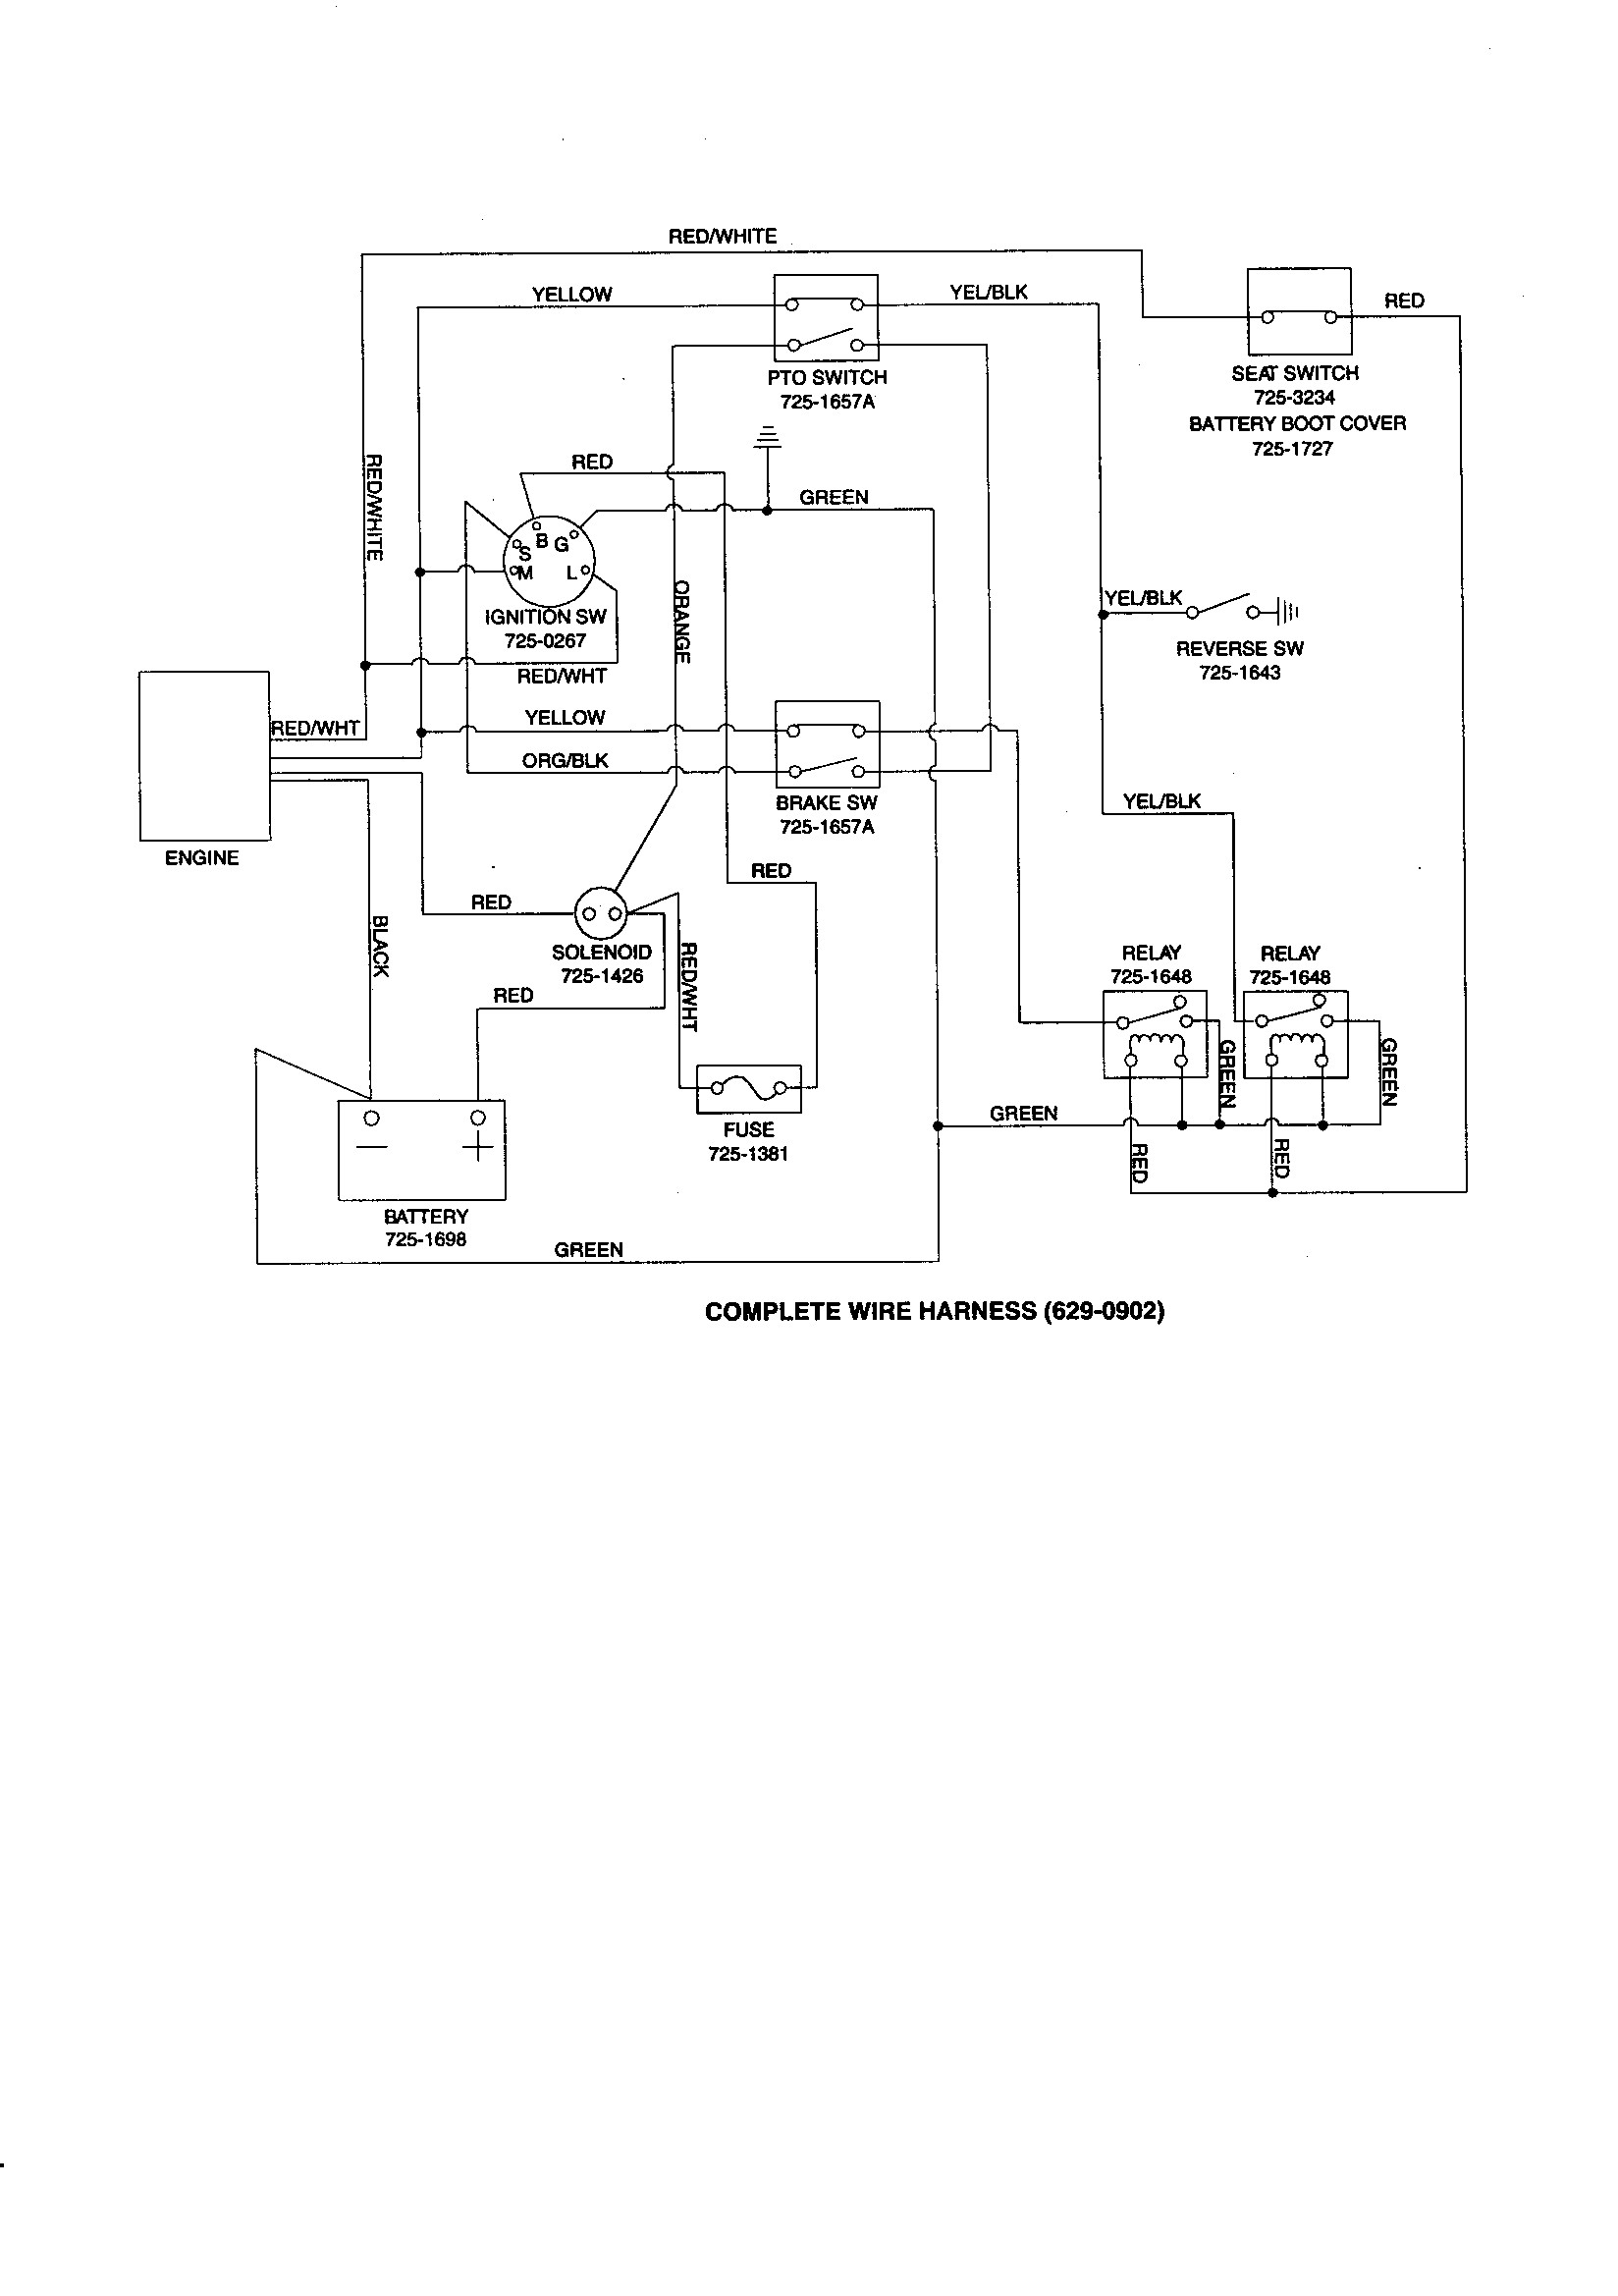 lesco mower wiring diagram wiring diagrams Bolens Riding Mower Won't Start lesco mower wiring diagram wiring diagram postlesco mower part diagram exmark lazer 3 relay wiring diagram